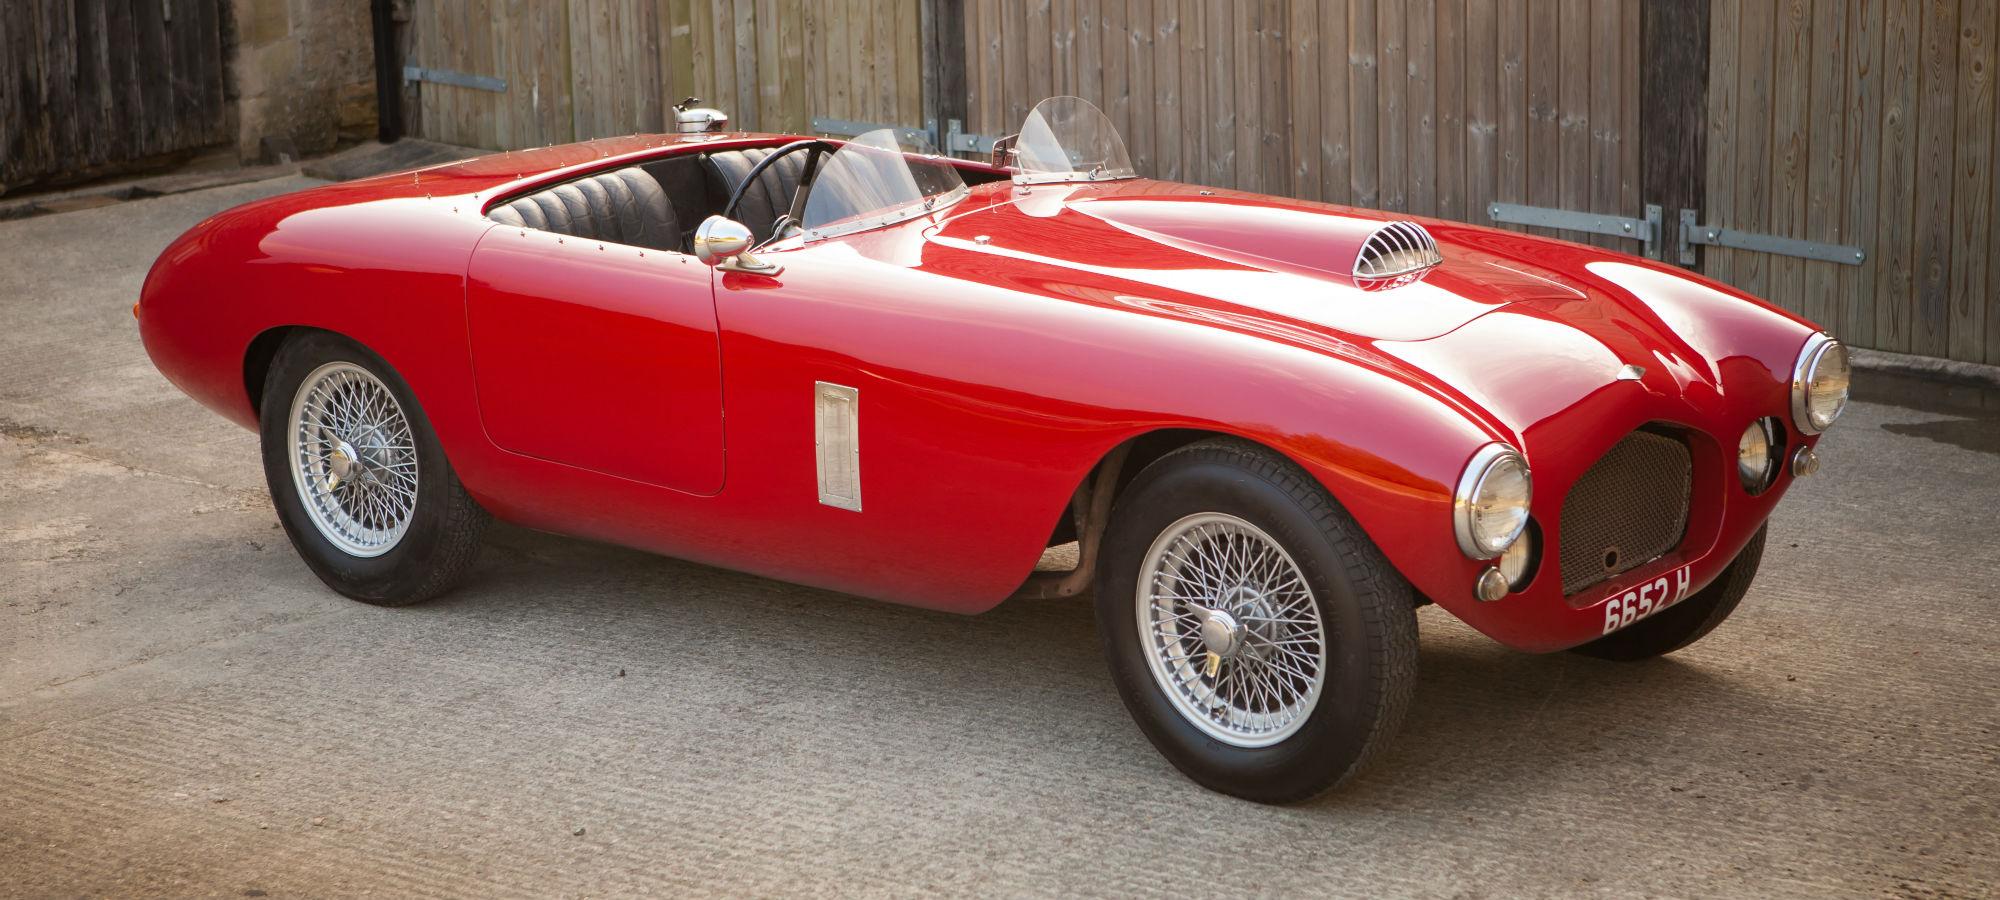 1953 Frazer Nash Targa Florio